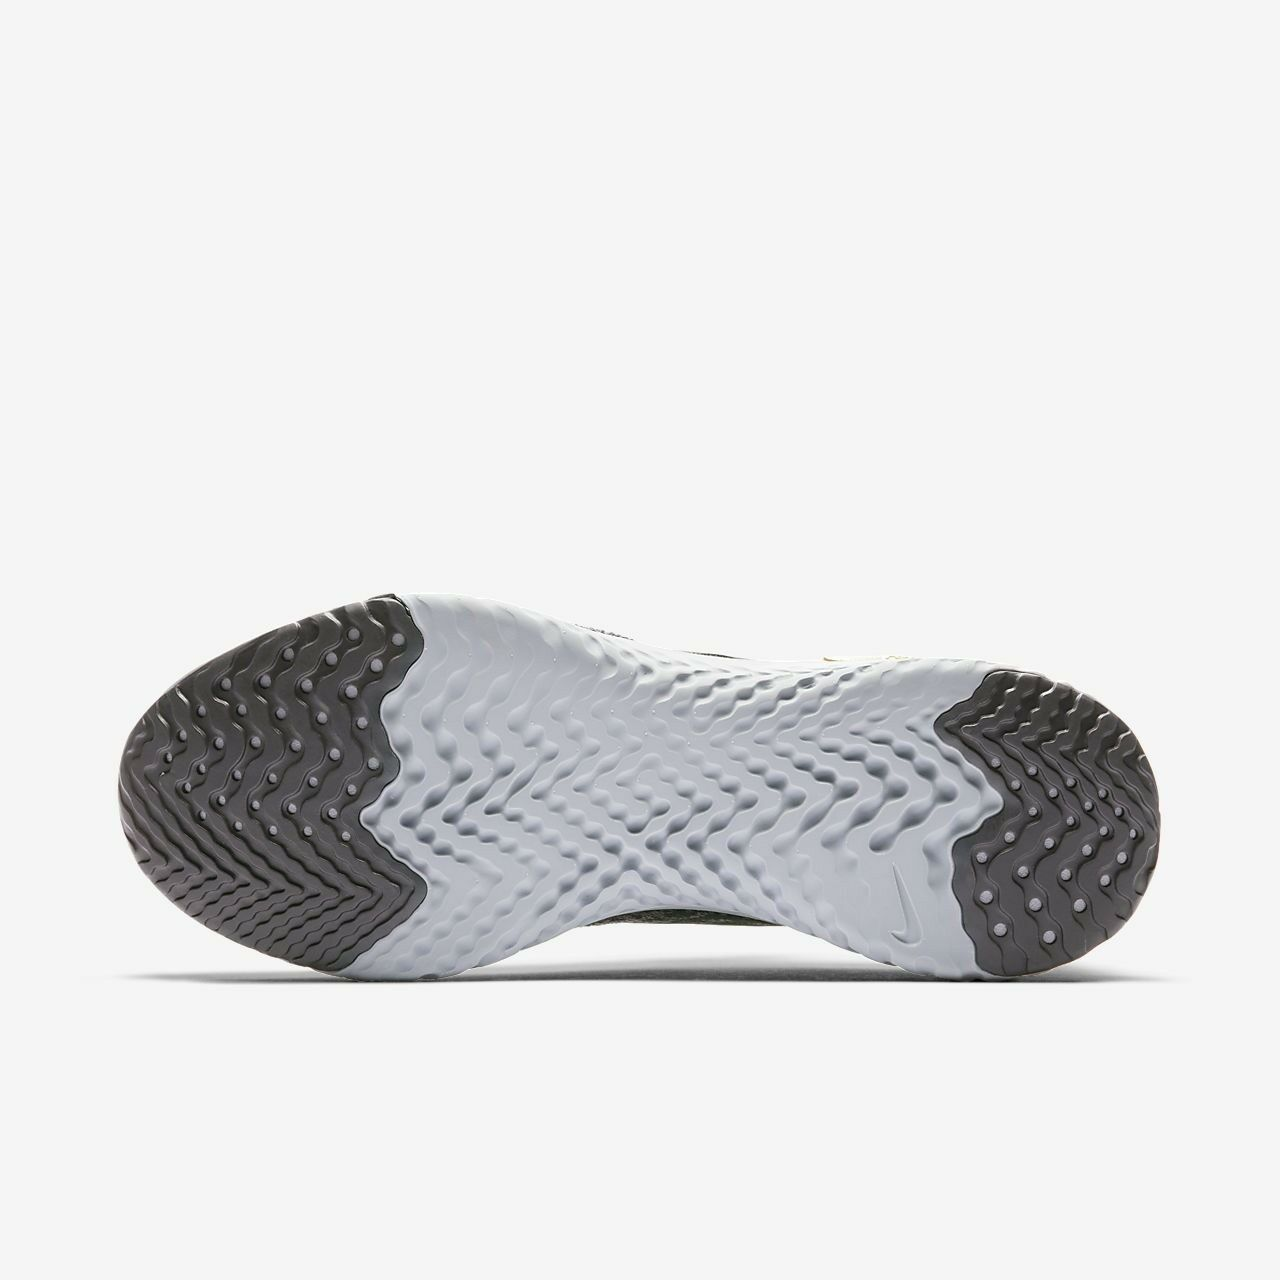 Nike Epic reagire Flyknit EU45 Thunder Grigio torba Nero muschio di torba Grigio metallica peltro 259550